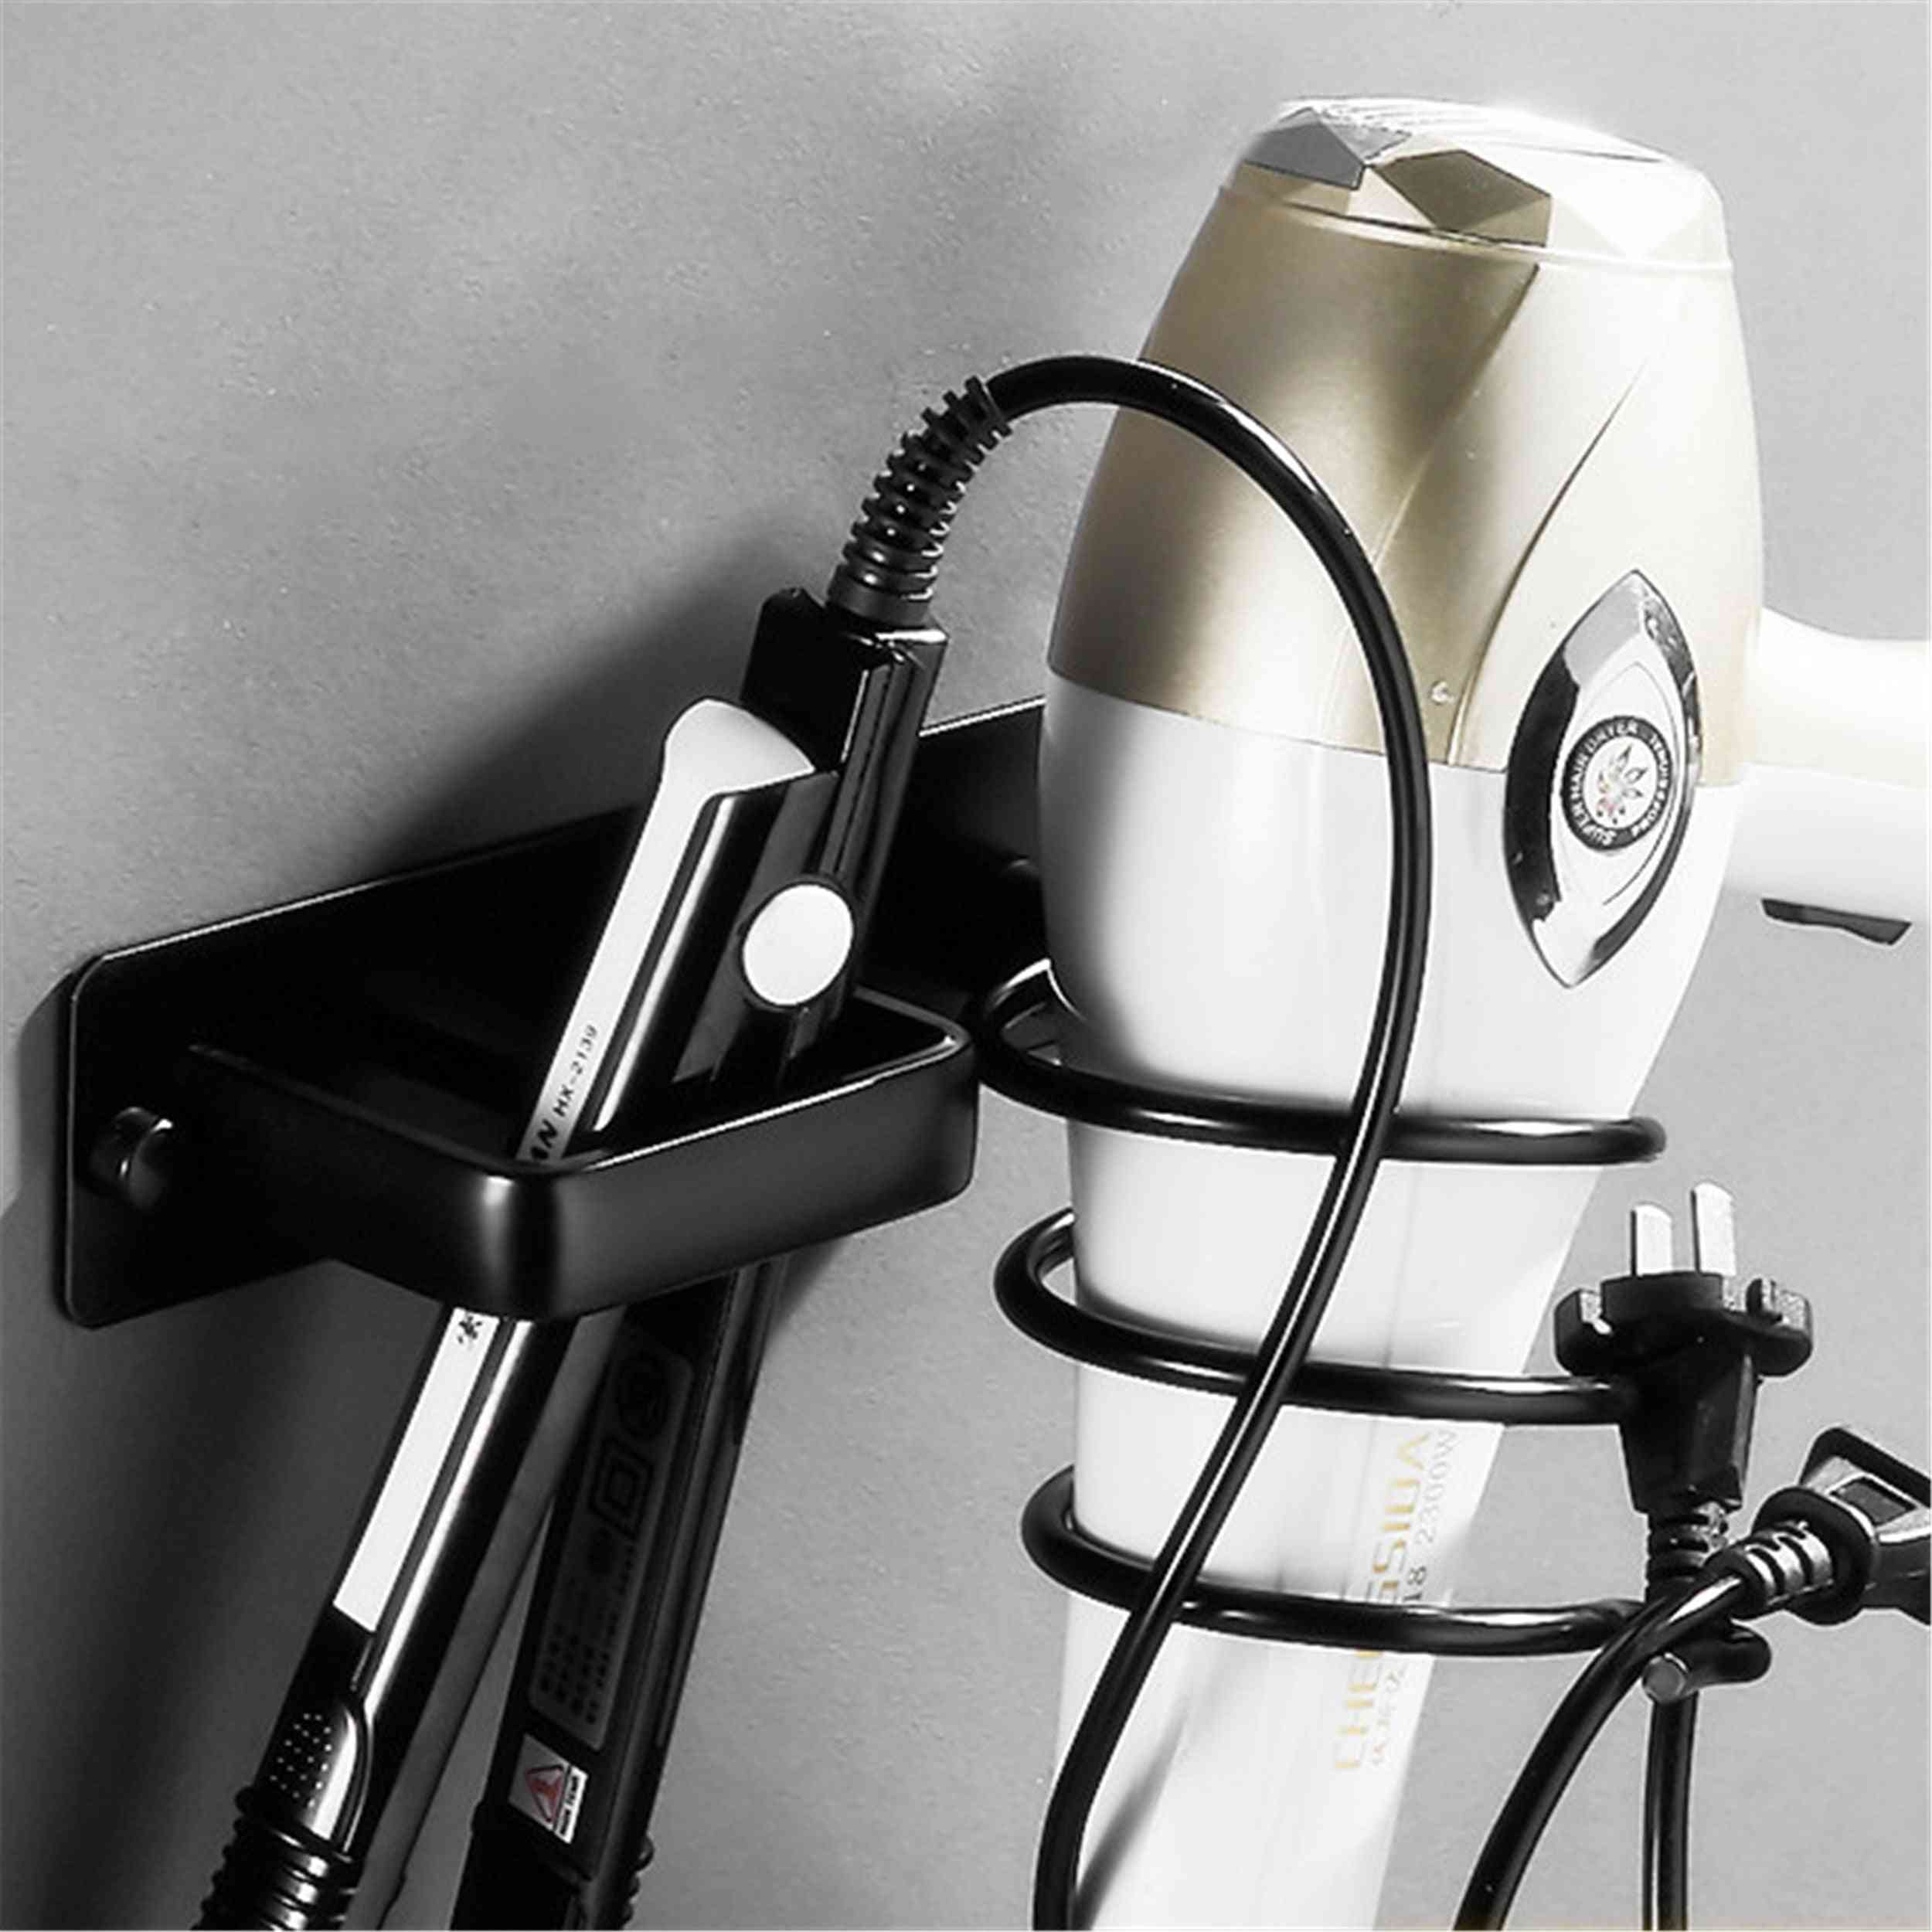 Wall Mounted Bathroom Hair Dryer Holder